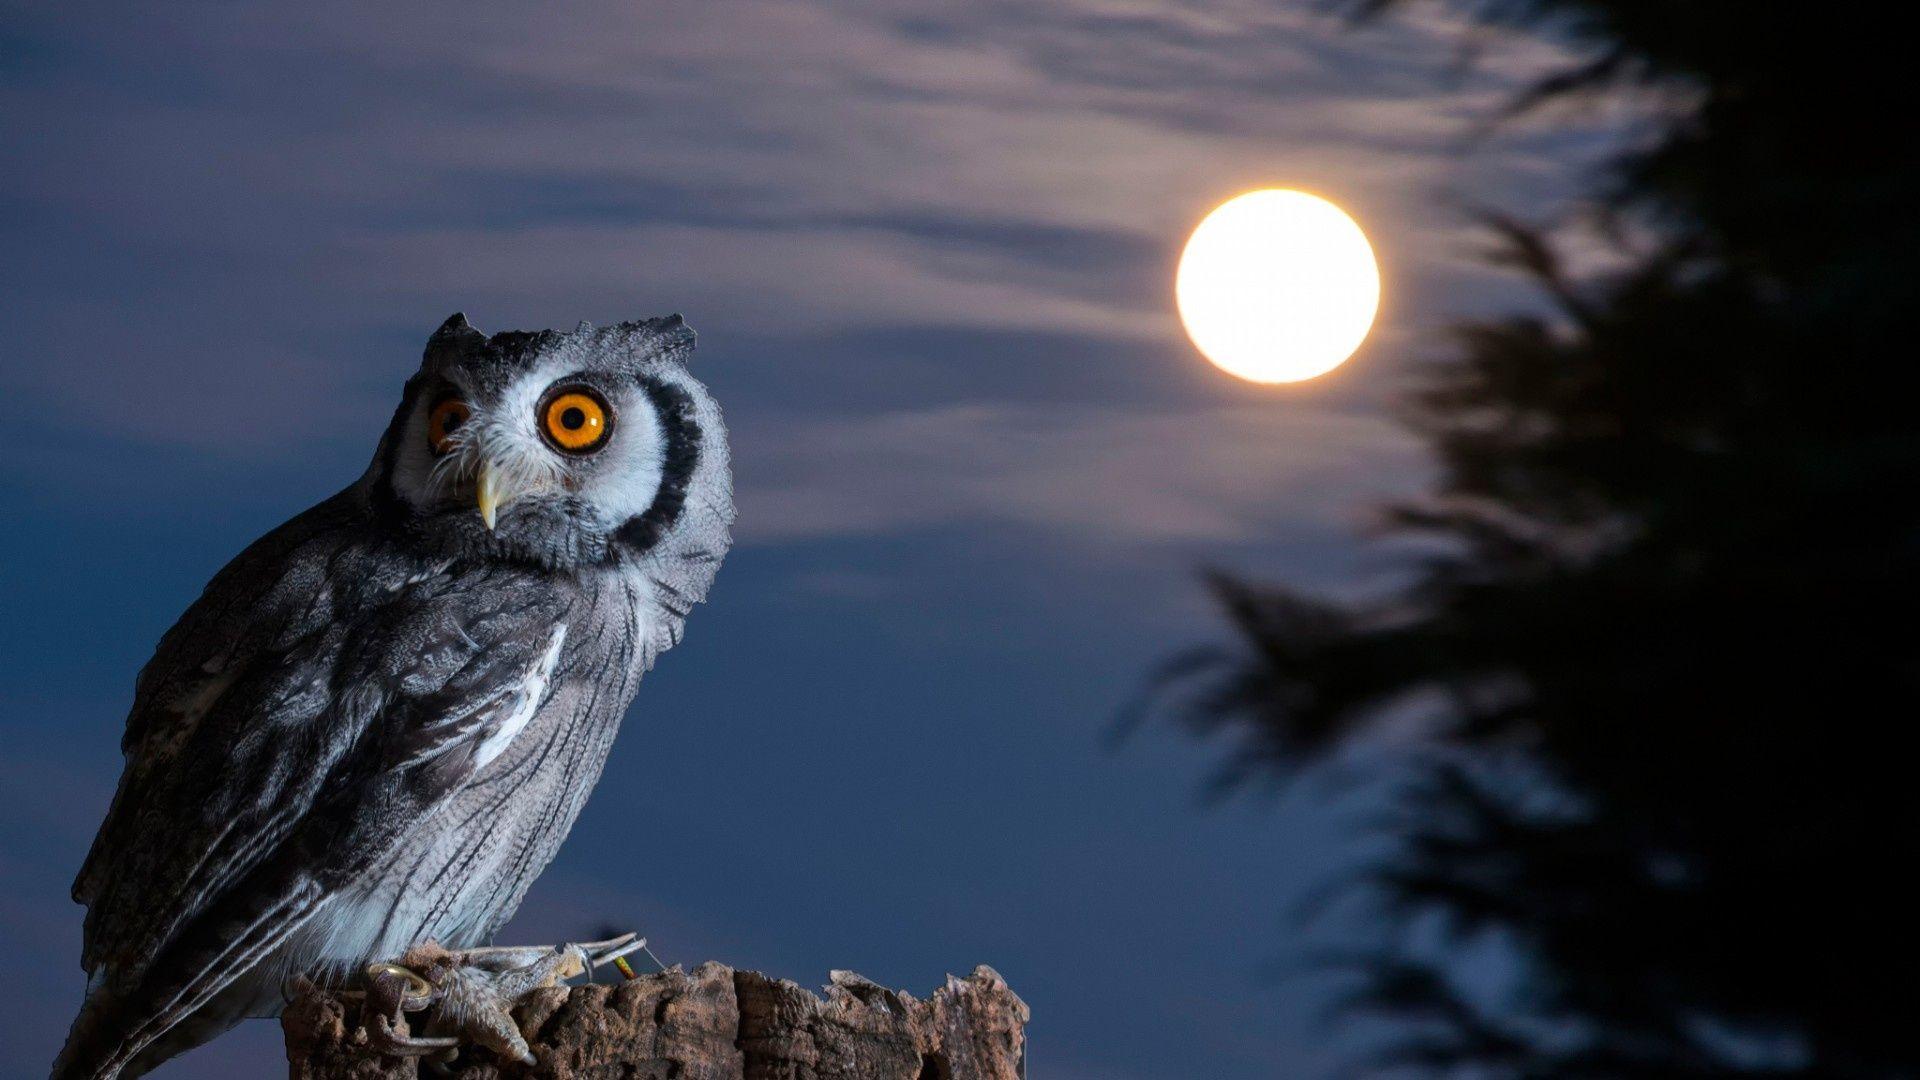 Dark Owl Wallpapers Wallpapers Backgrounds Images Art Photos Owl Wallpaper Owl Owl Bird